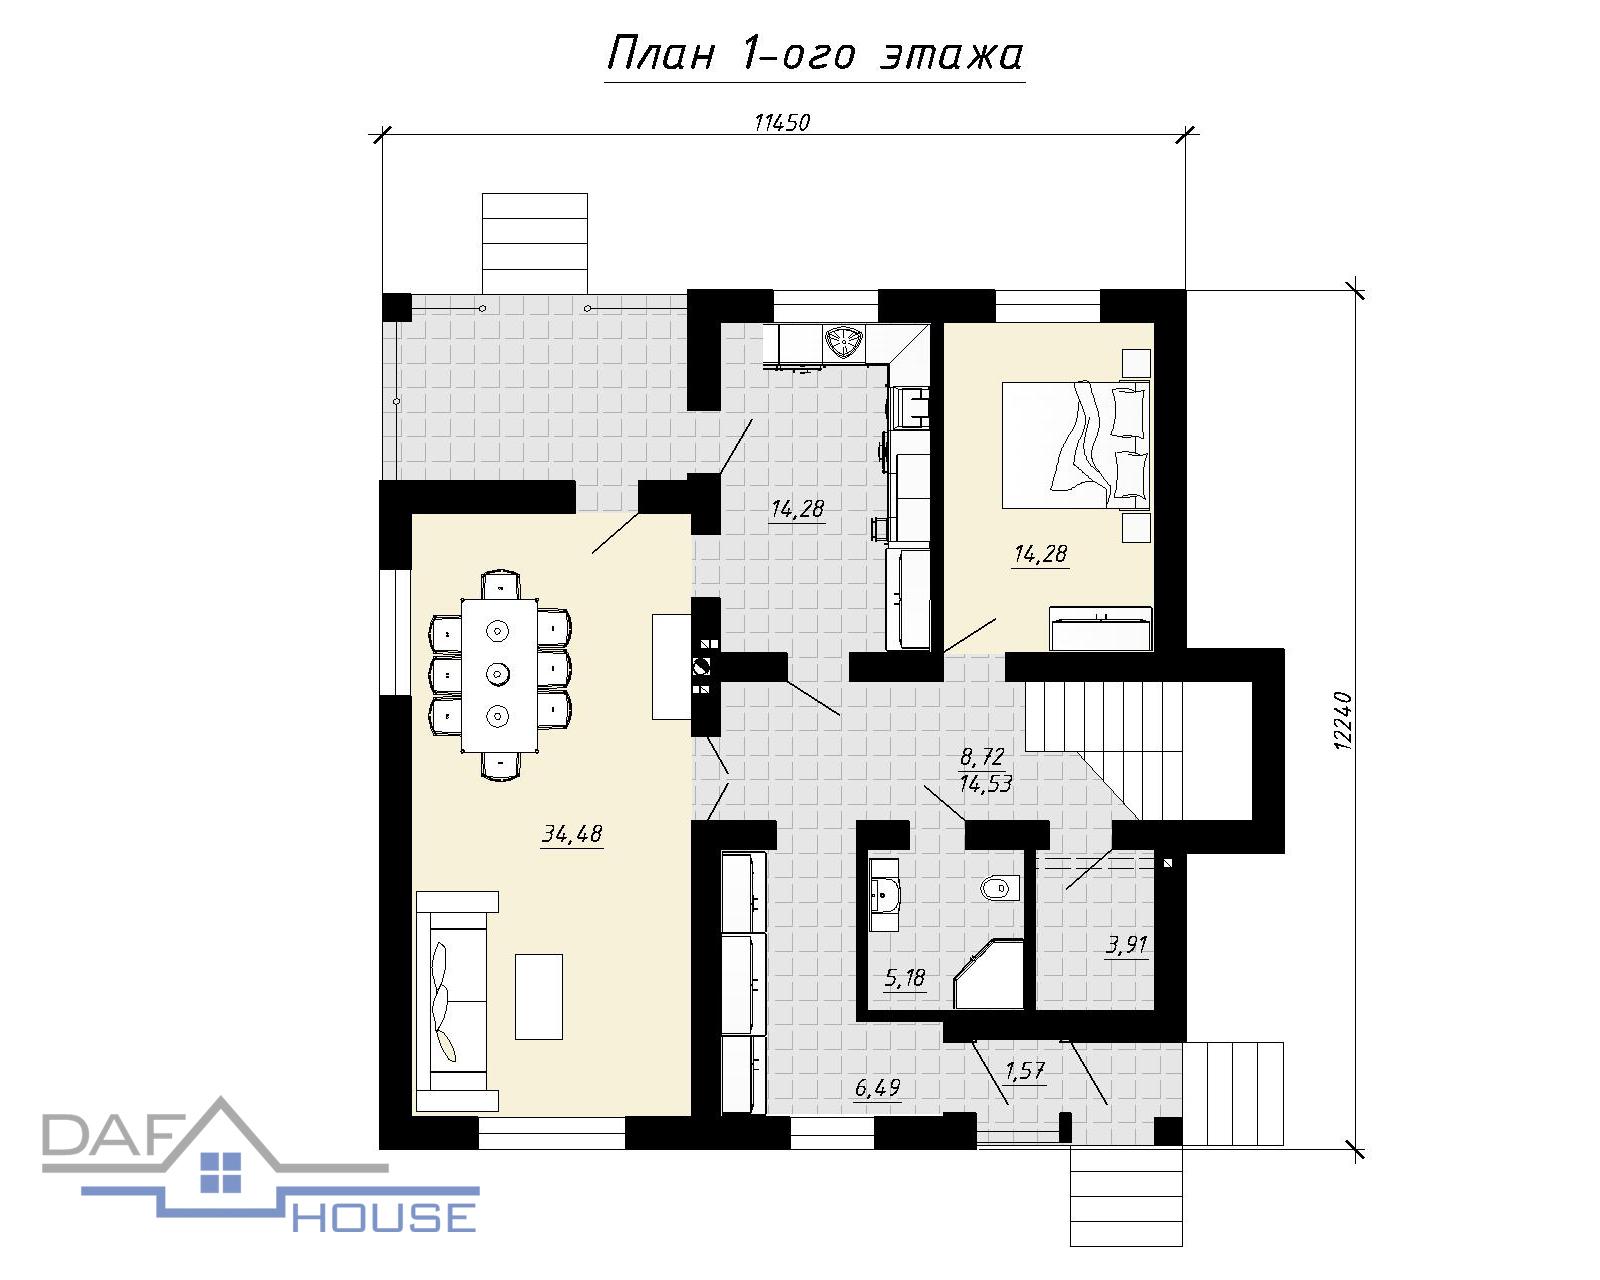 Проект В1054 план